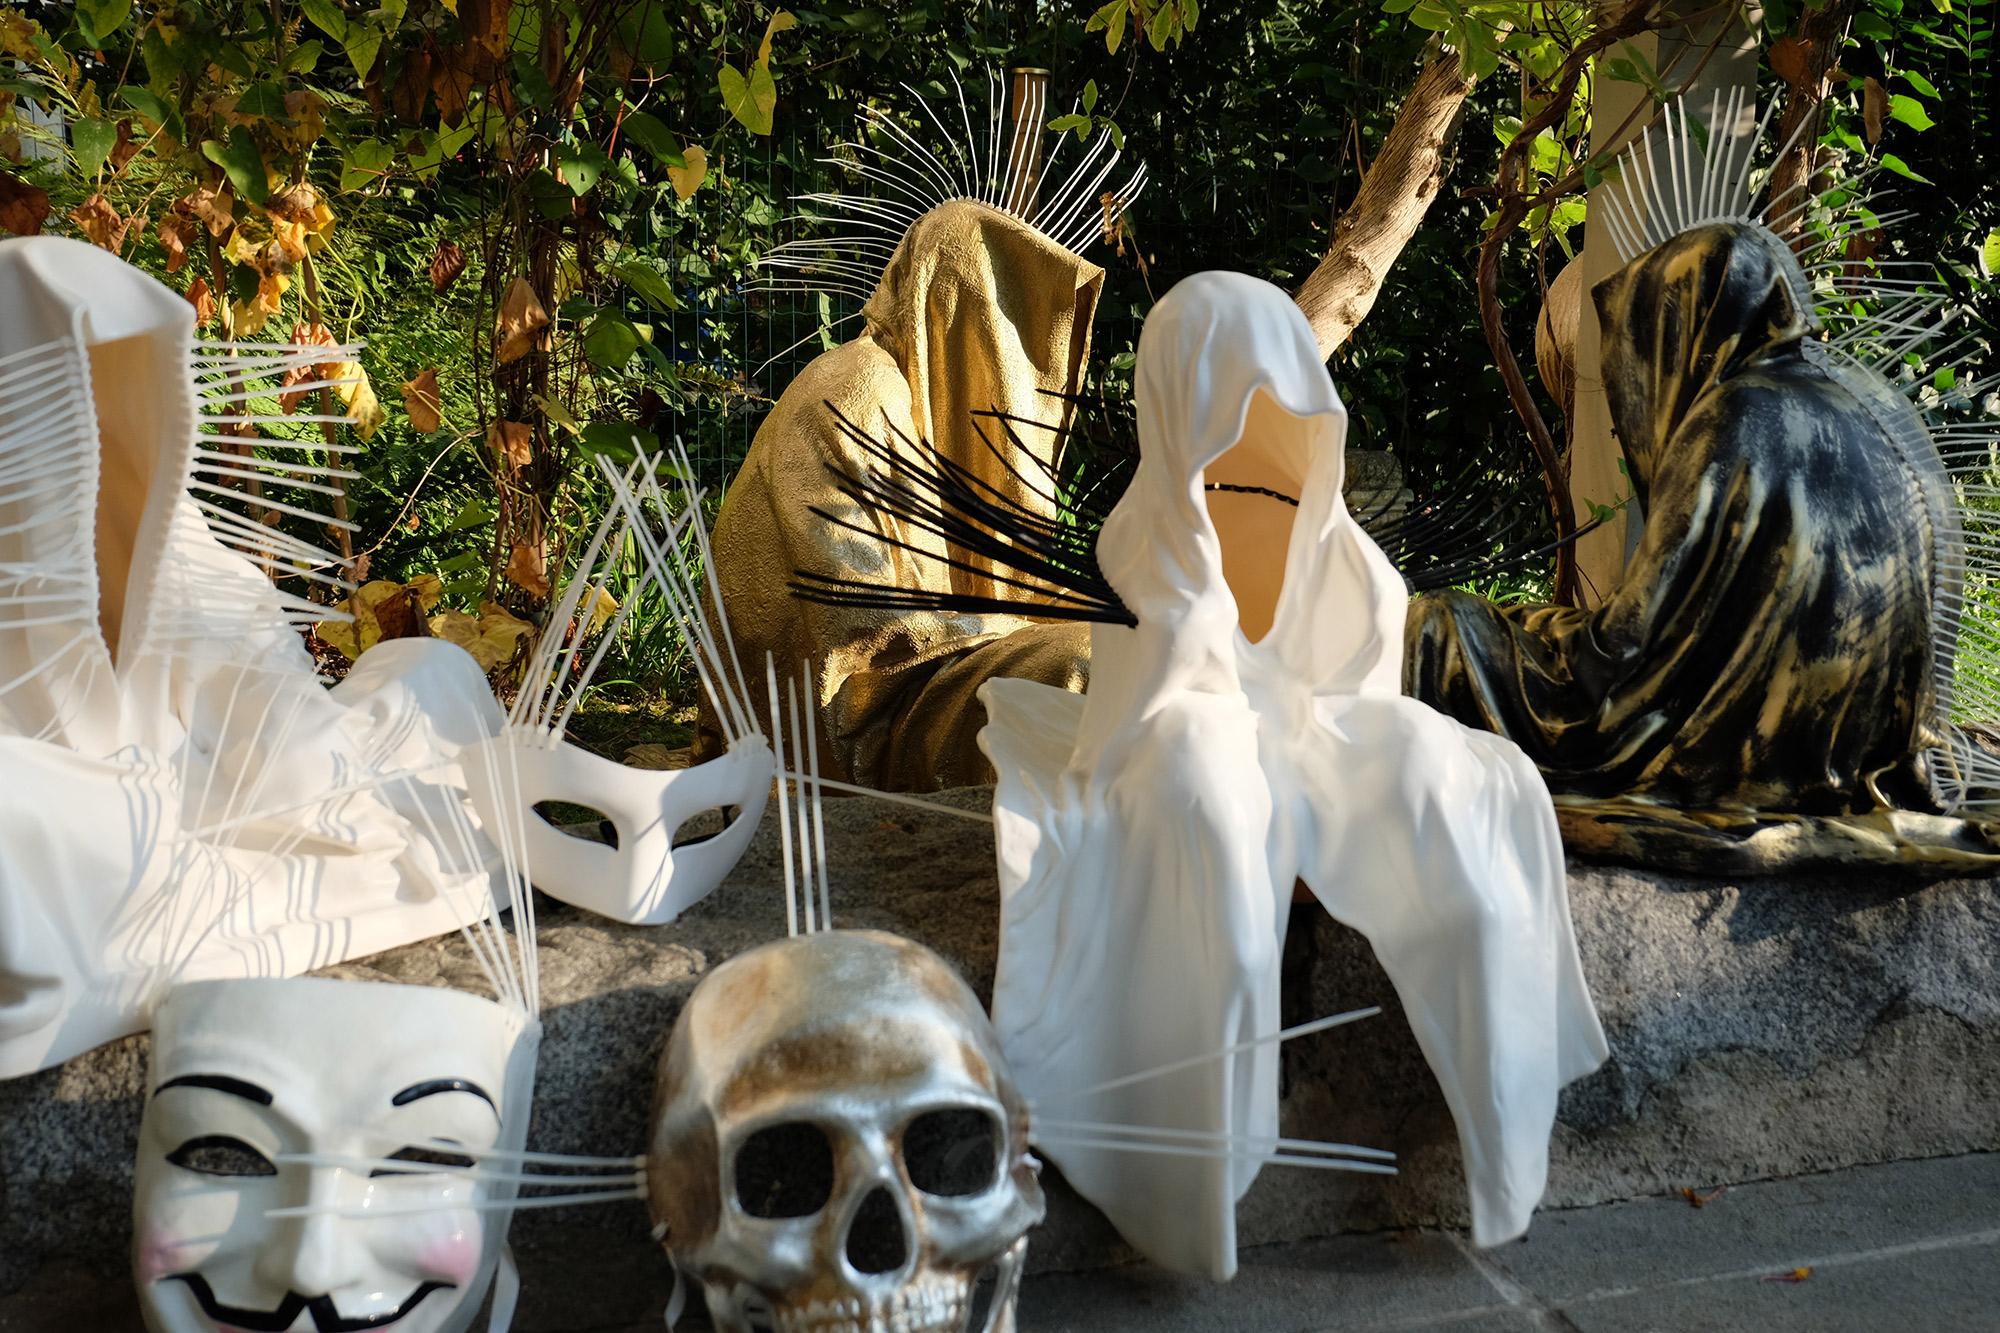 #faceless-#mask-#cableties-#ziptie-ty-#guardiansoftime-#manfredkielnhofer-#contemporaryart-#arts-#design-#sculpture-#statue-#museum-#gallery-#fineart-#lightart-#ghost-#anonymous-8101